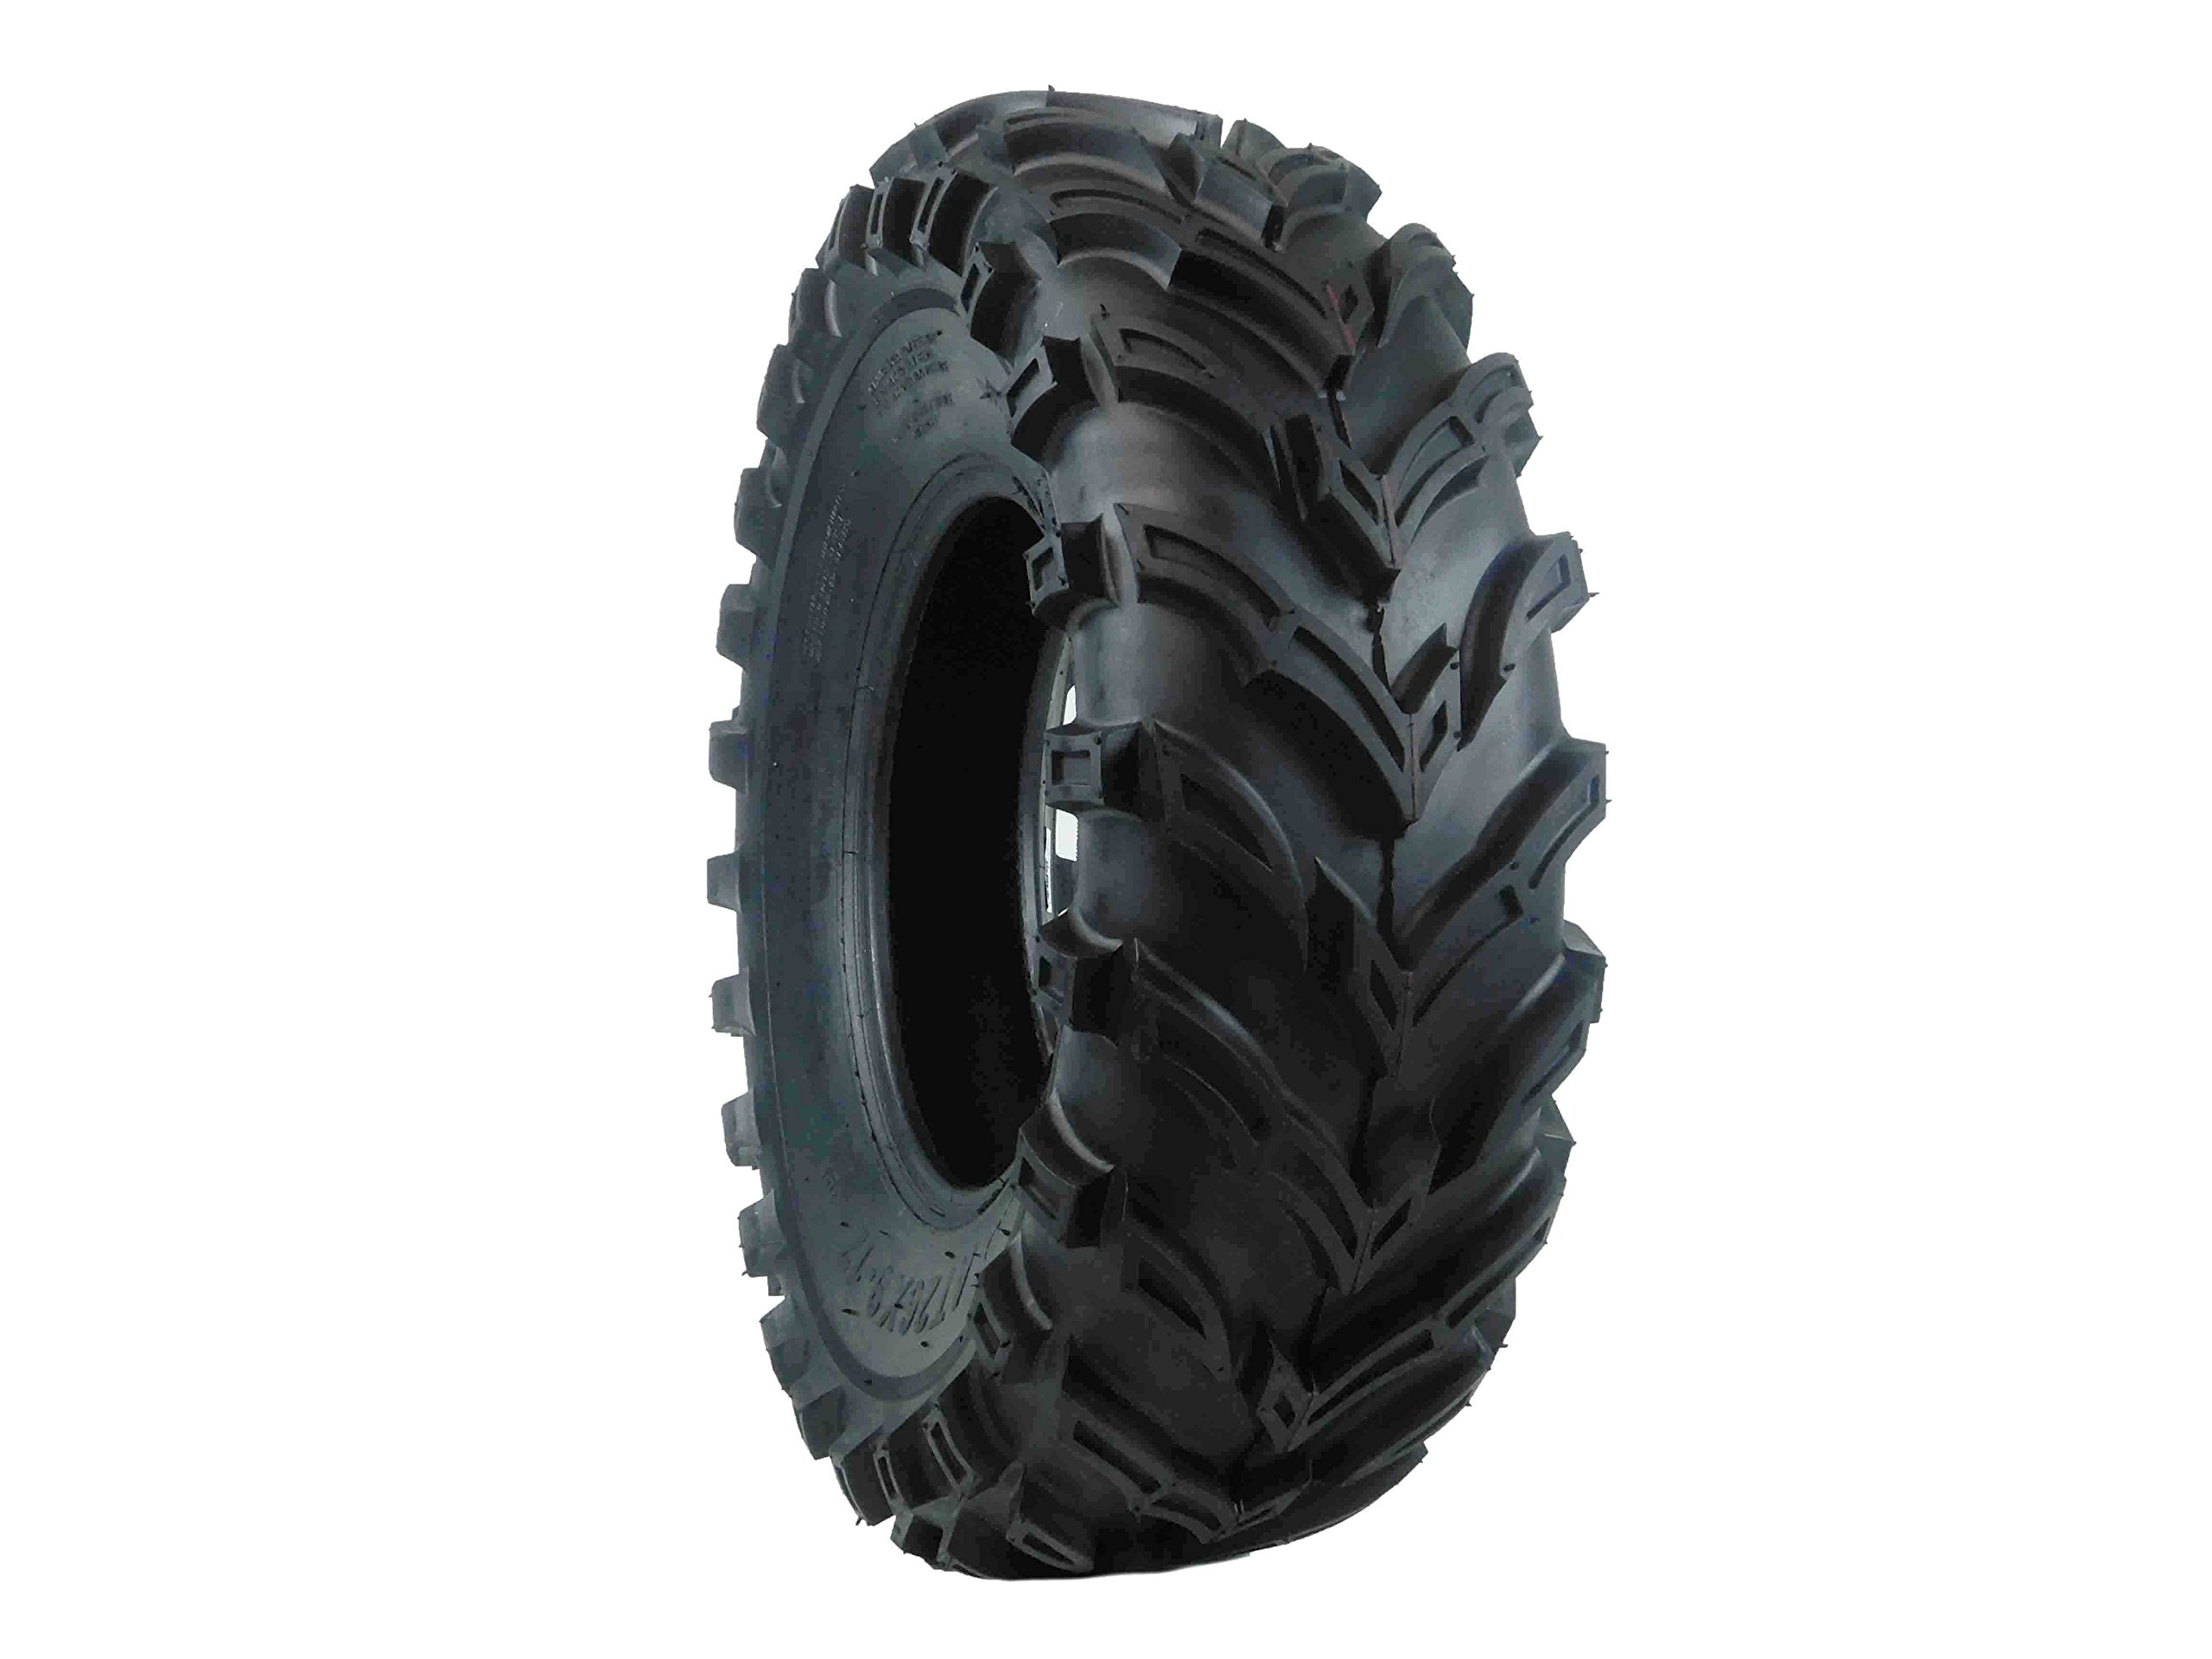 2 New ATV//UTV Tires 26x11-12 26x11x12 6PR  w//warranty  26/'/' 26x11-12